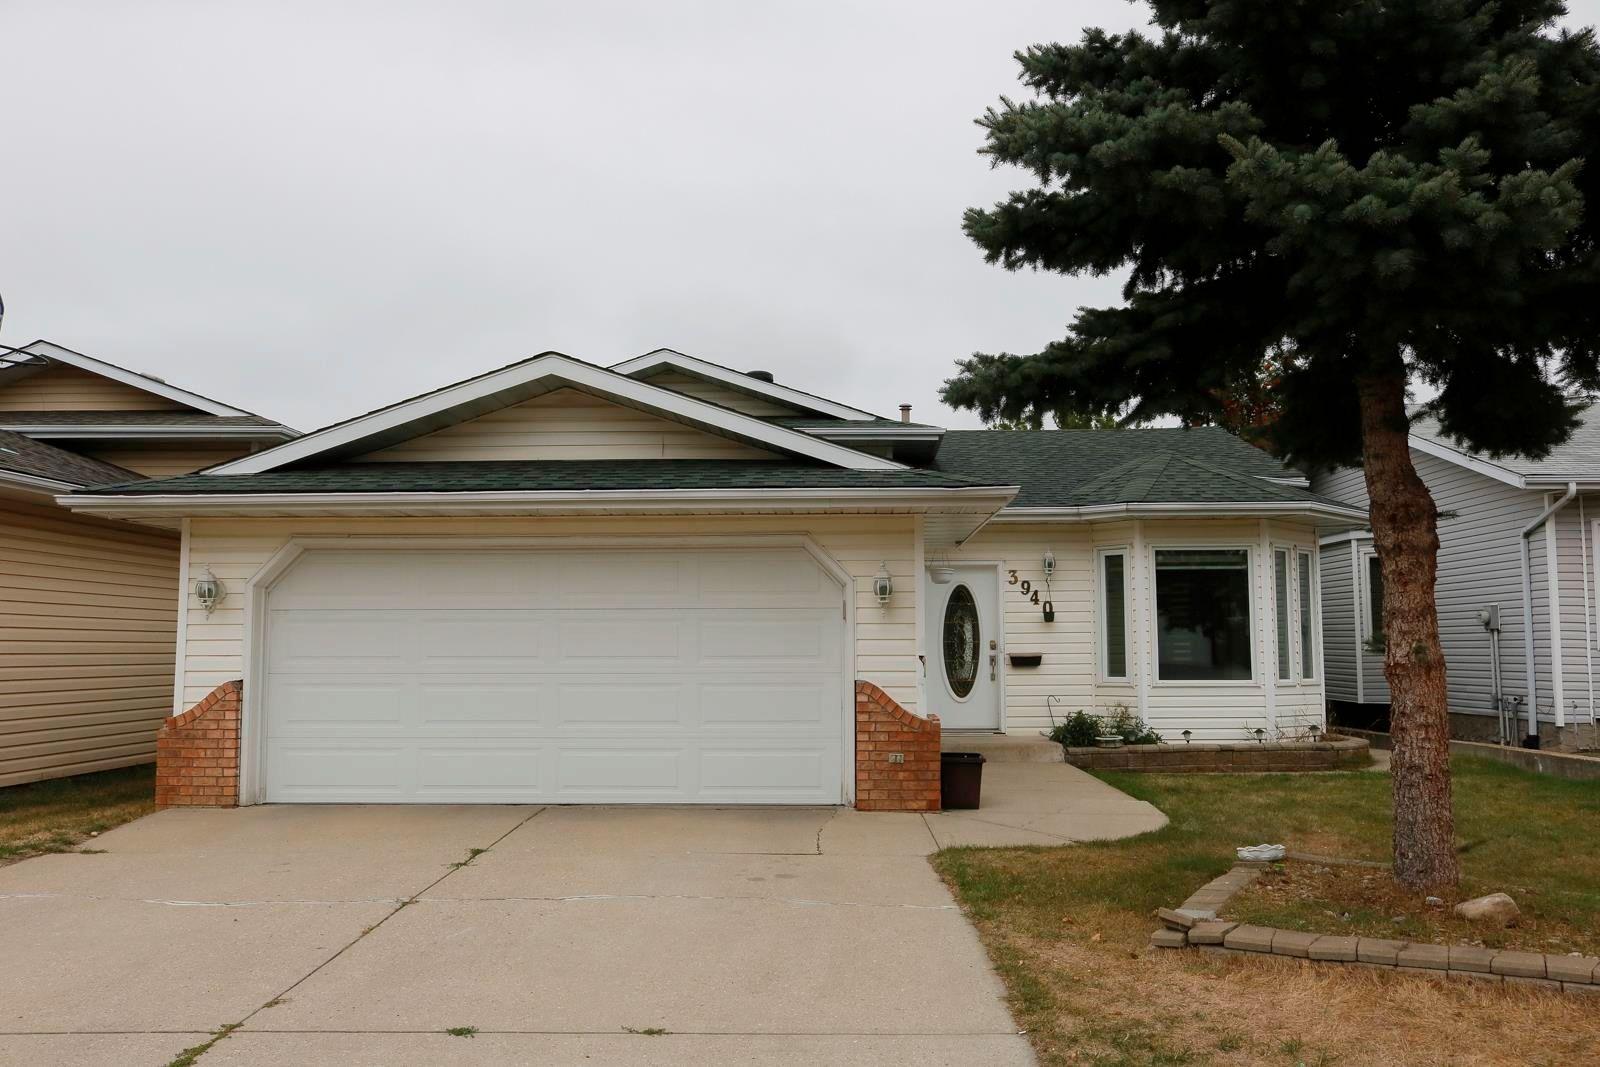 Main Photo: 3940 22 Avenue in Edmonton: Zone 29 House for sale : MLS®# E4261221